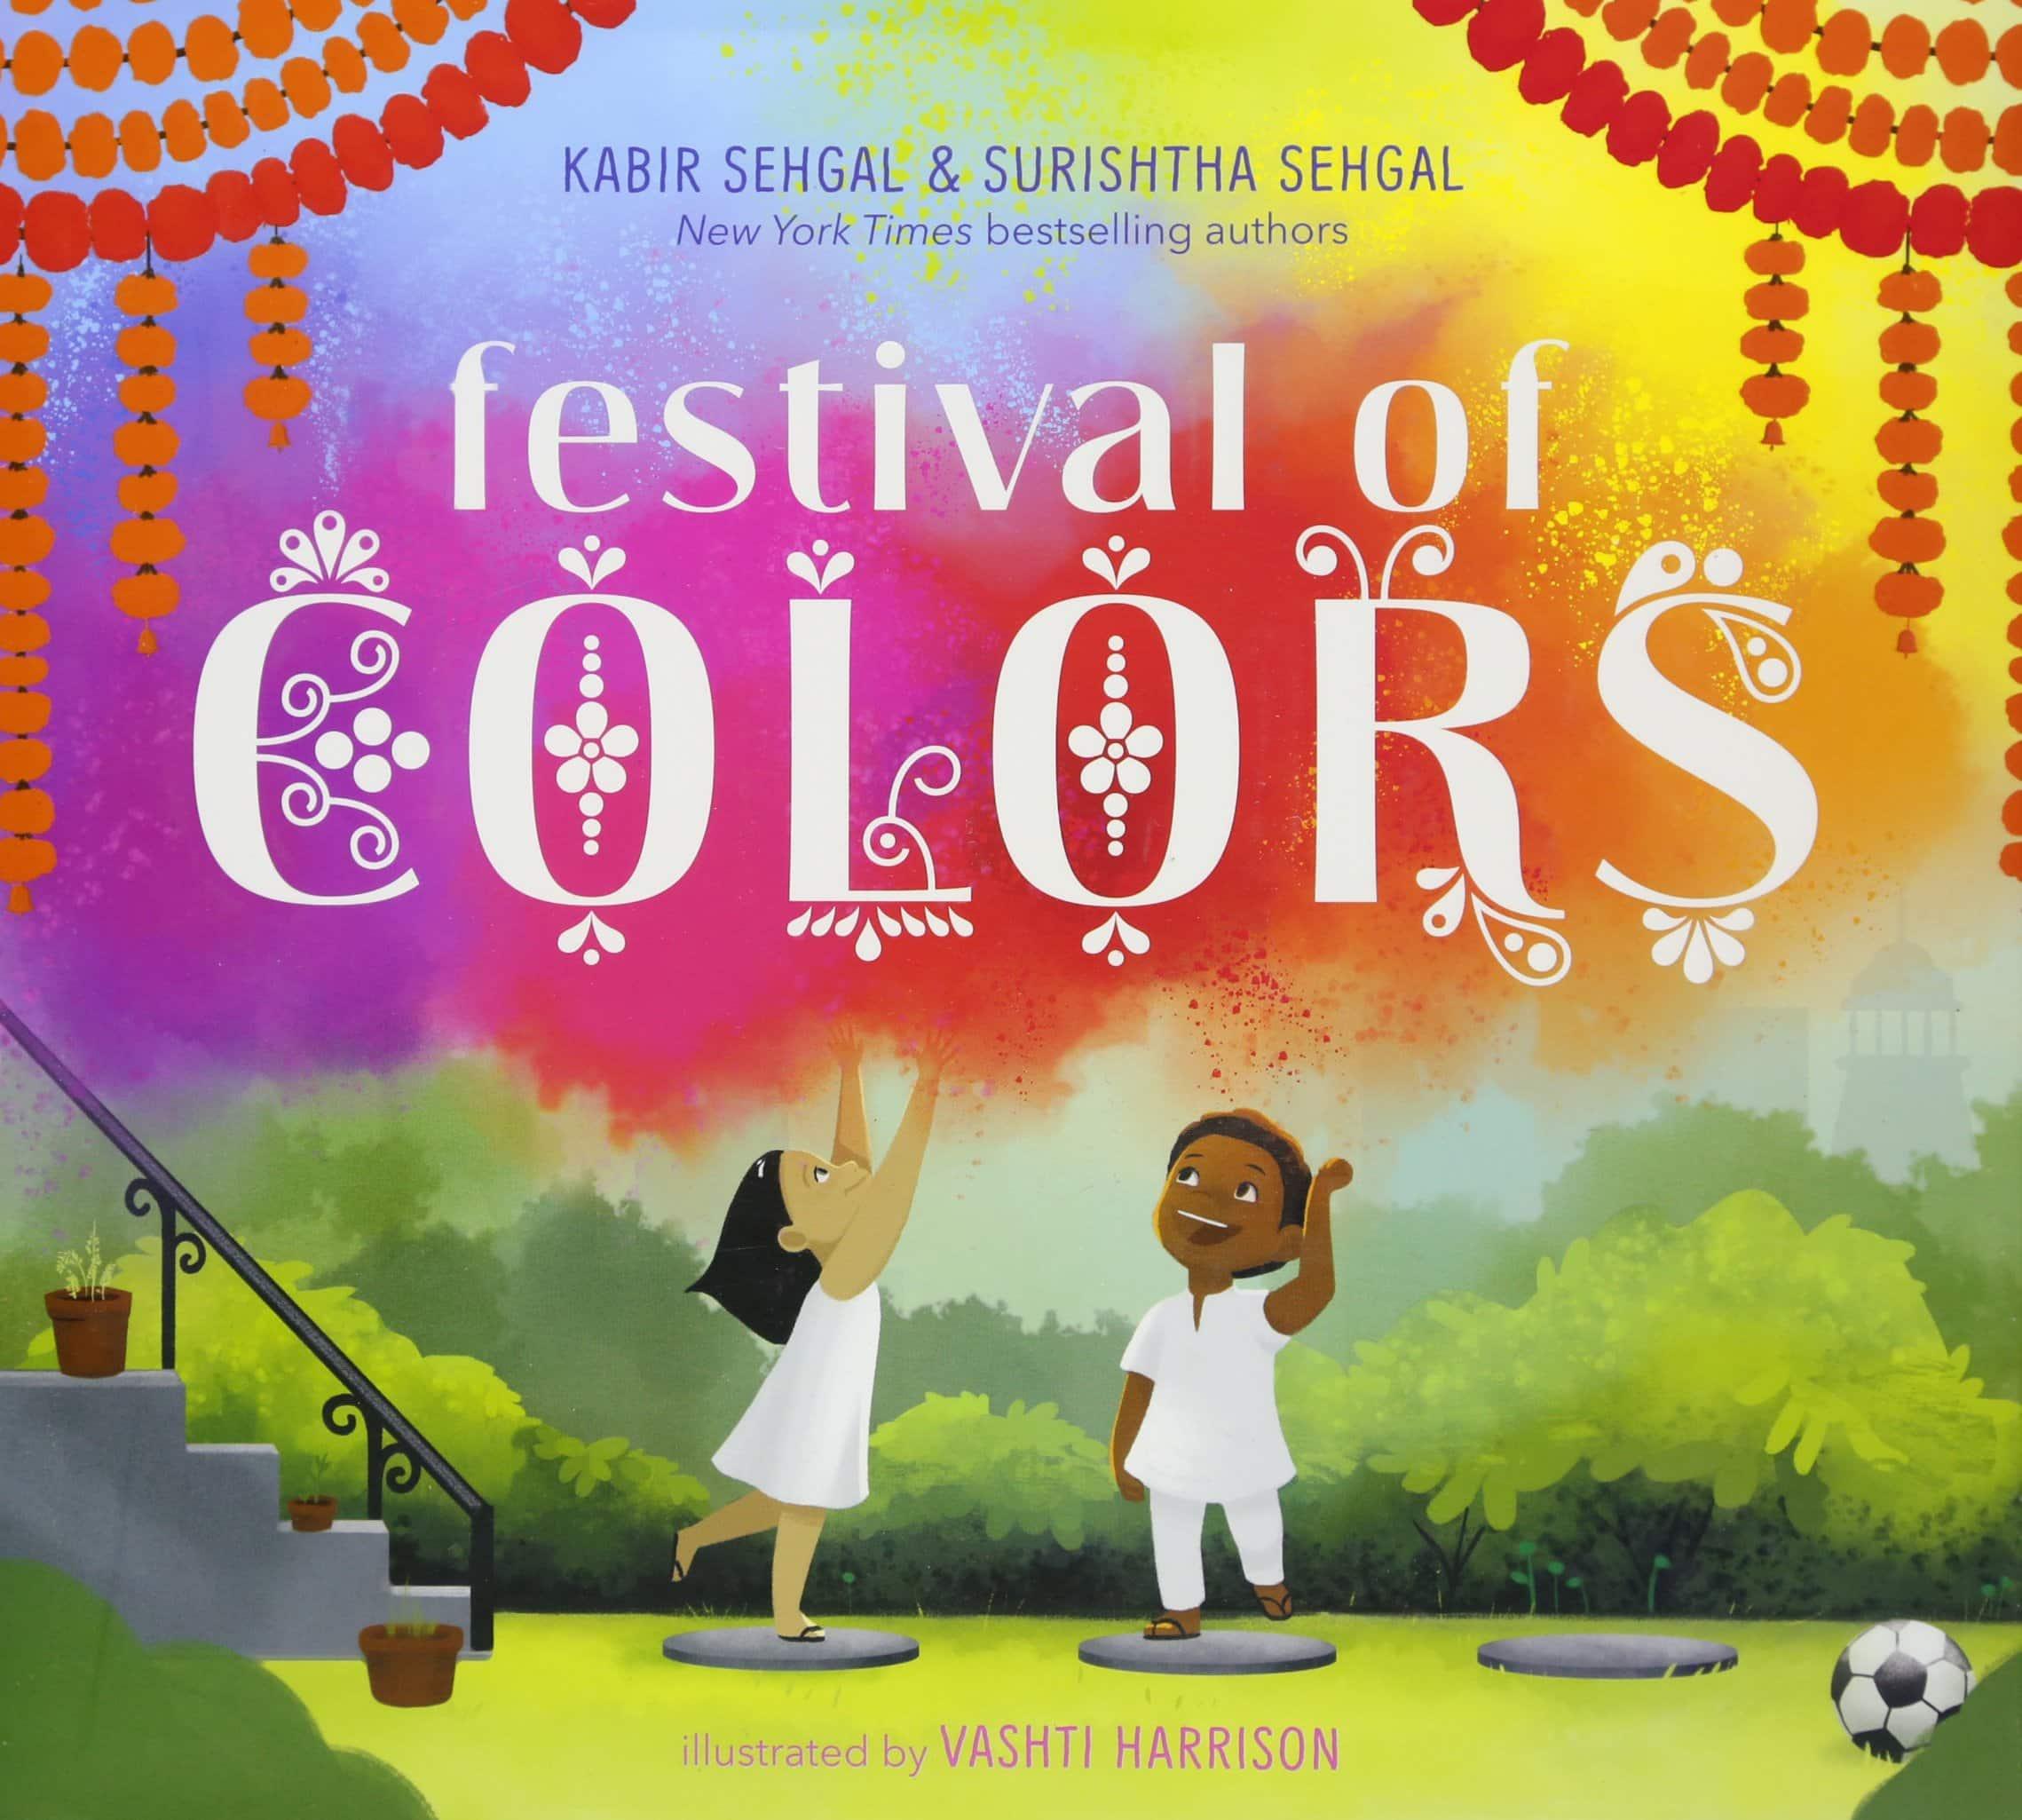 Festival of Colors Kabir Sehgal Surishtha